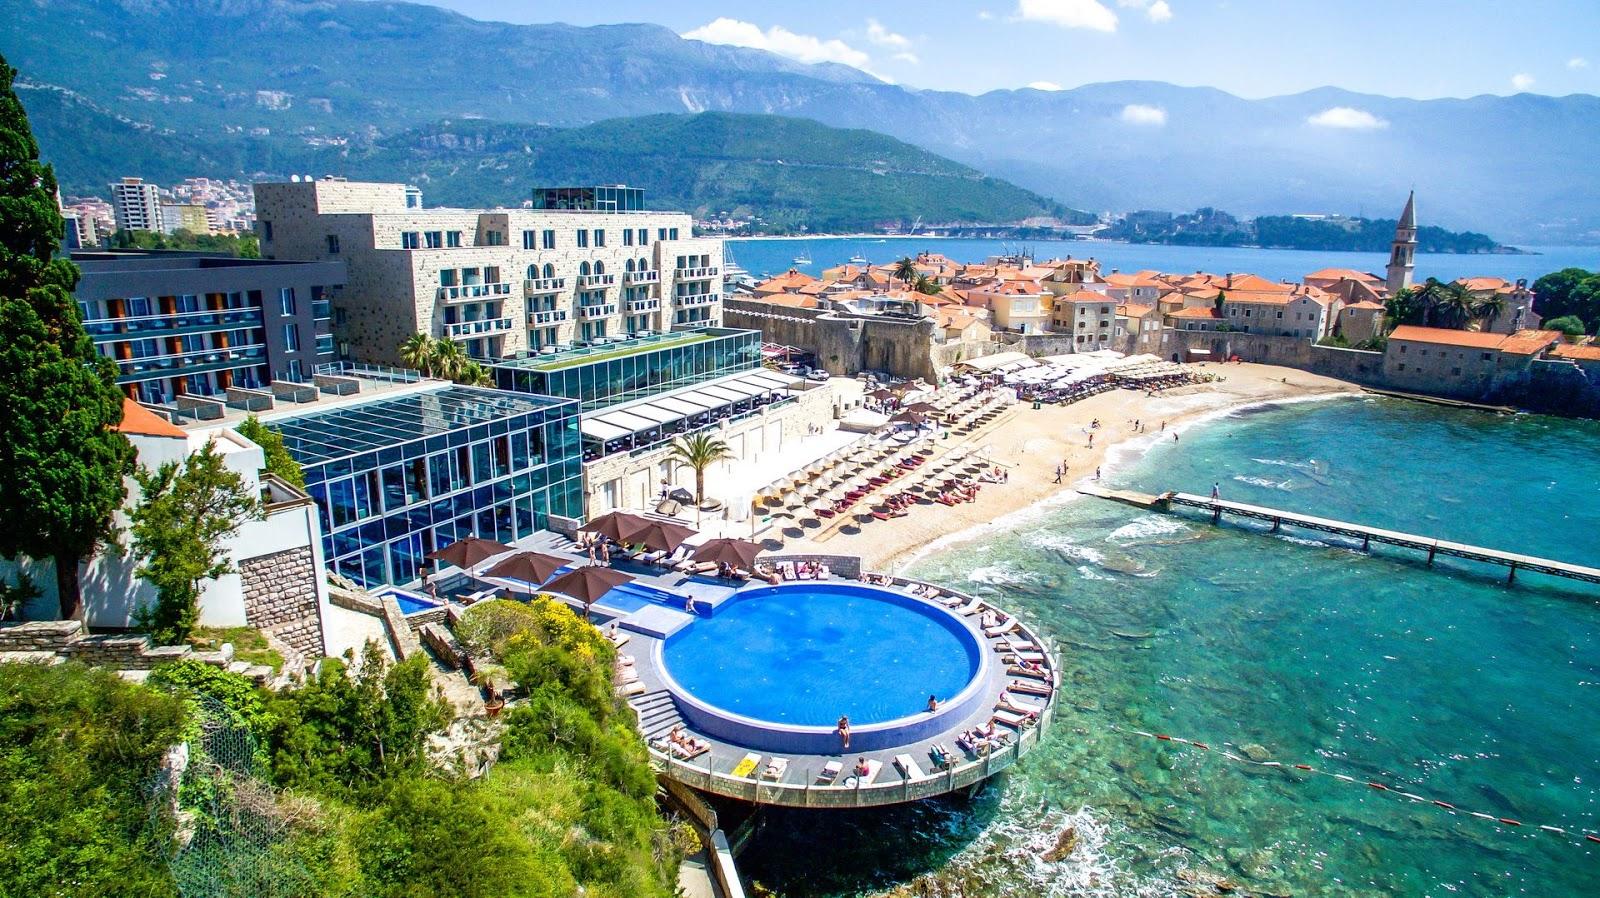 The Balkans Chronicle Welcome To Budva Tourist